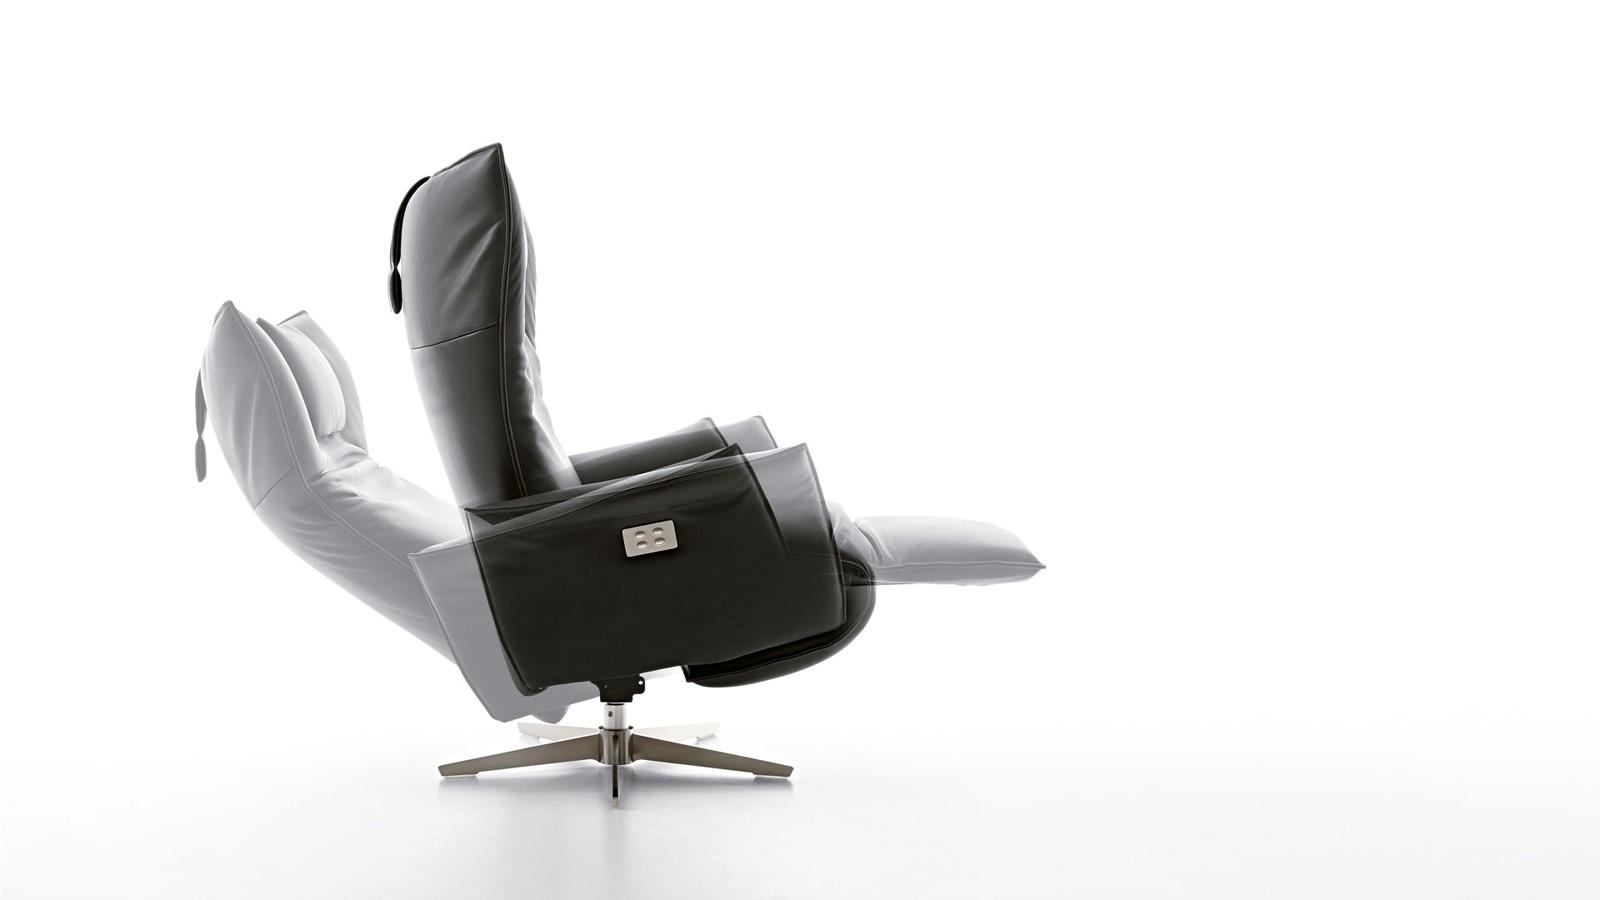 Fotoliu recliner cu masaj Koinor Swan - Silencio